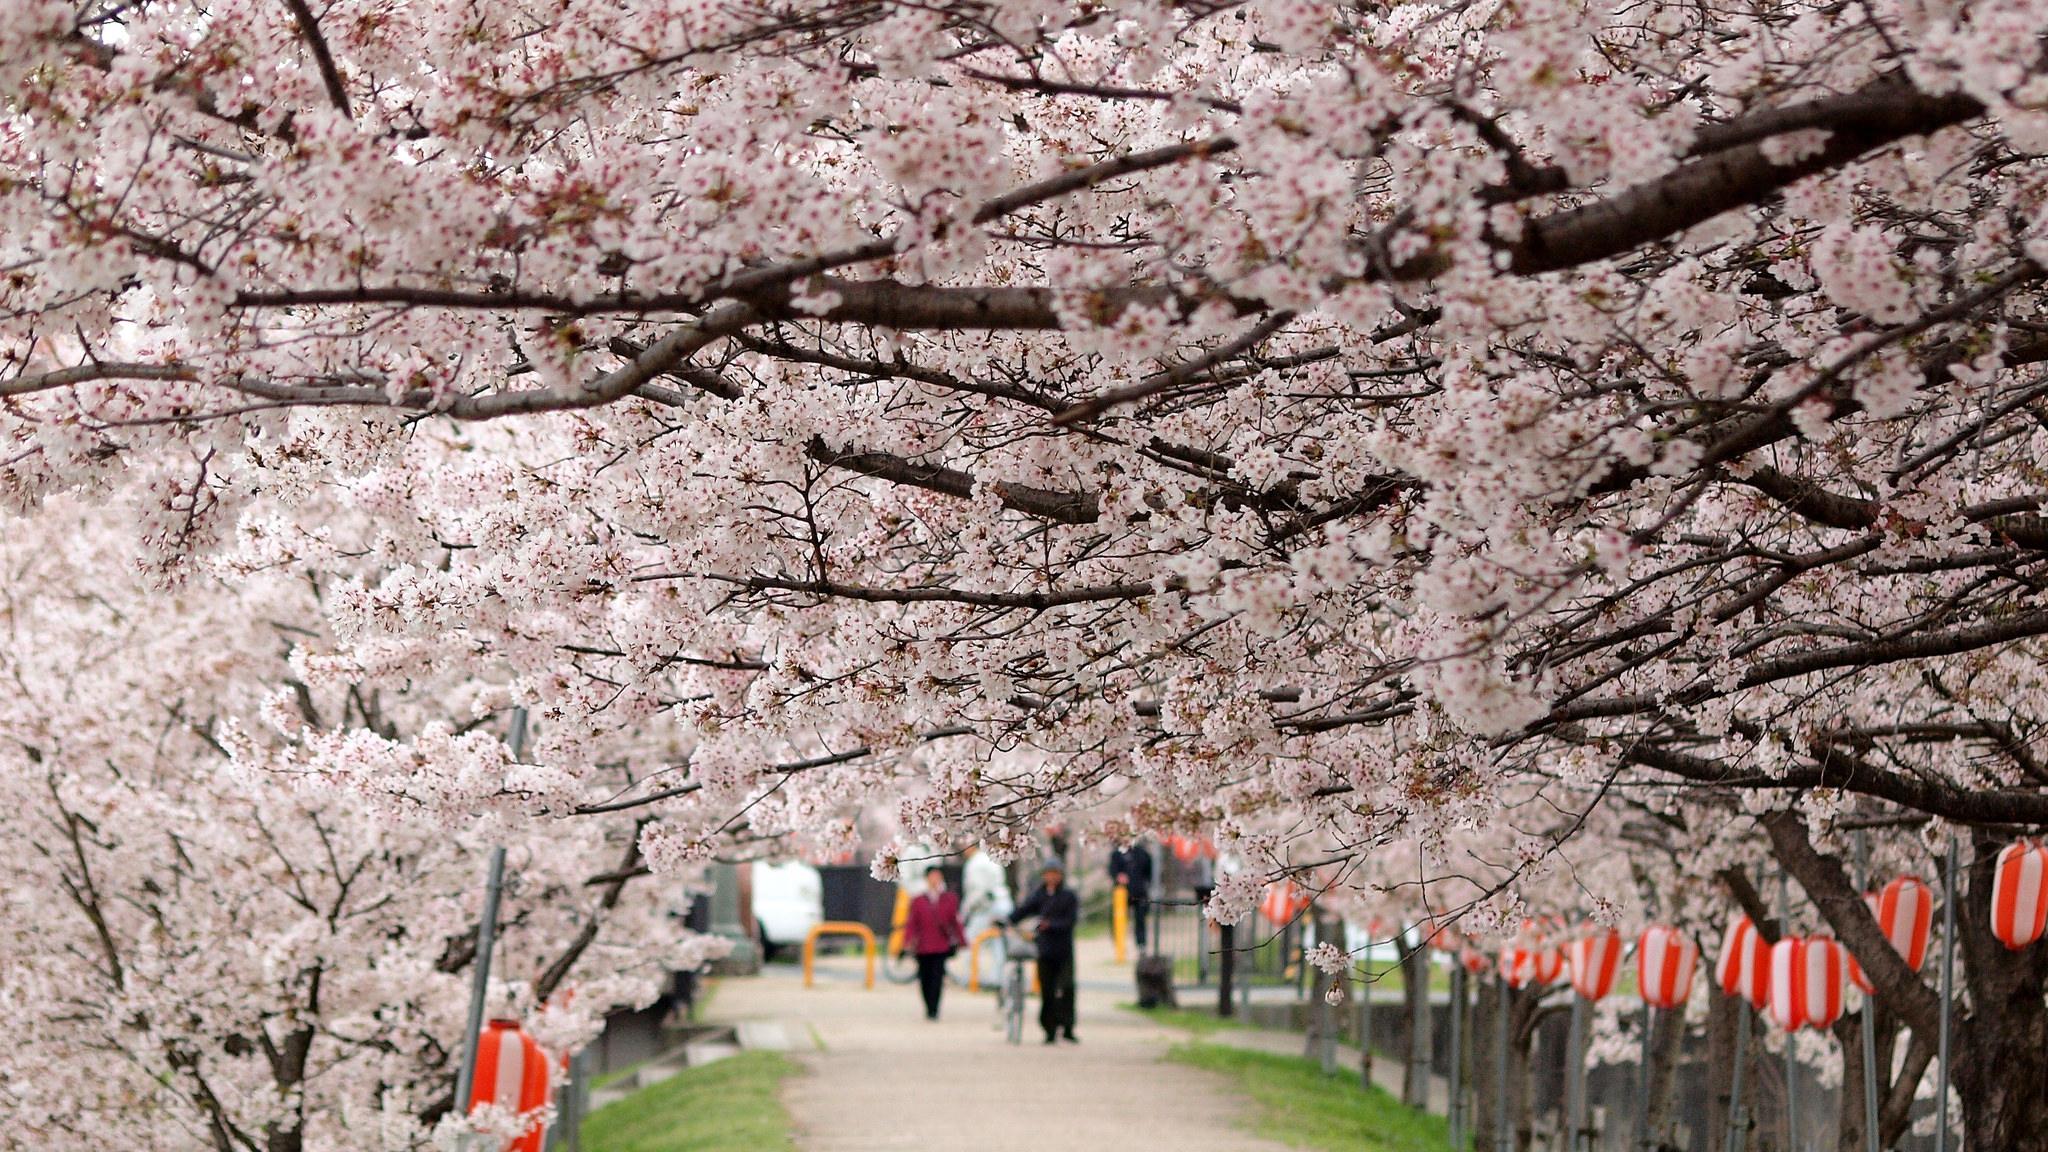 cherry blossom festival 2020 - HD1920×1080